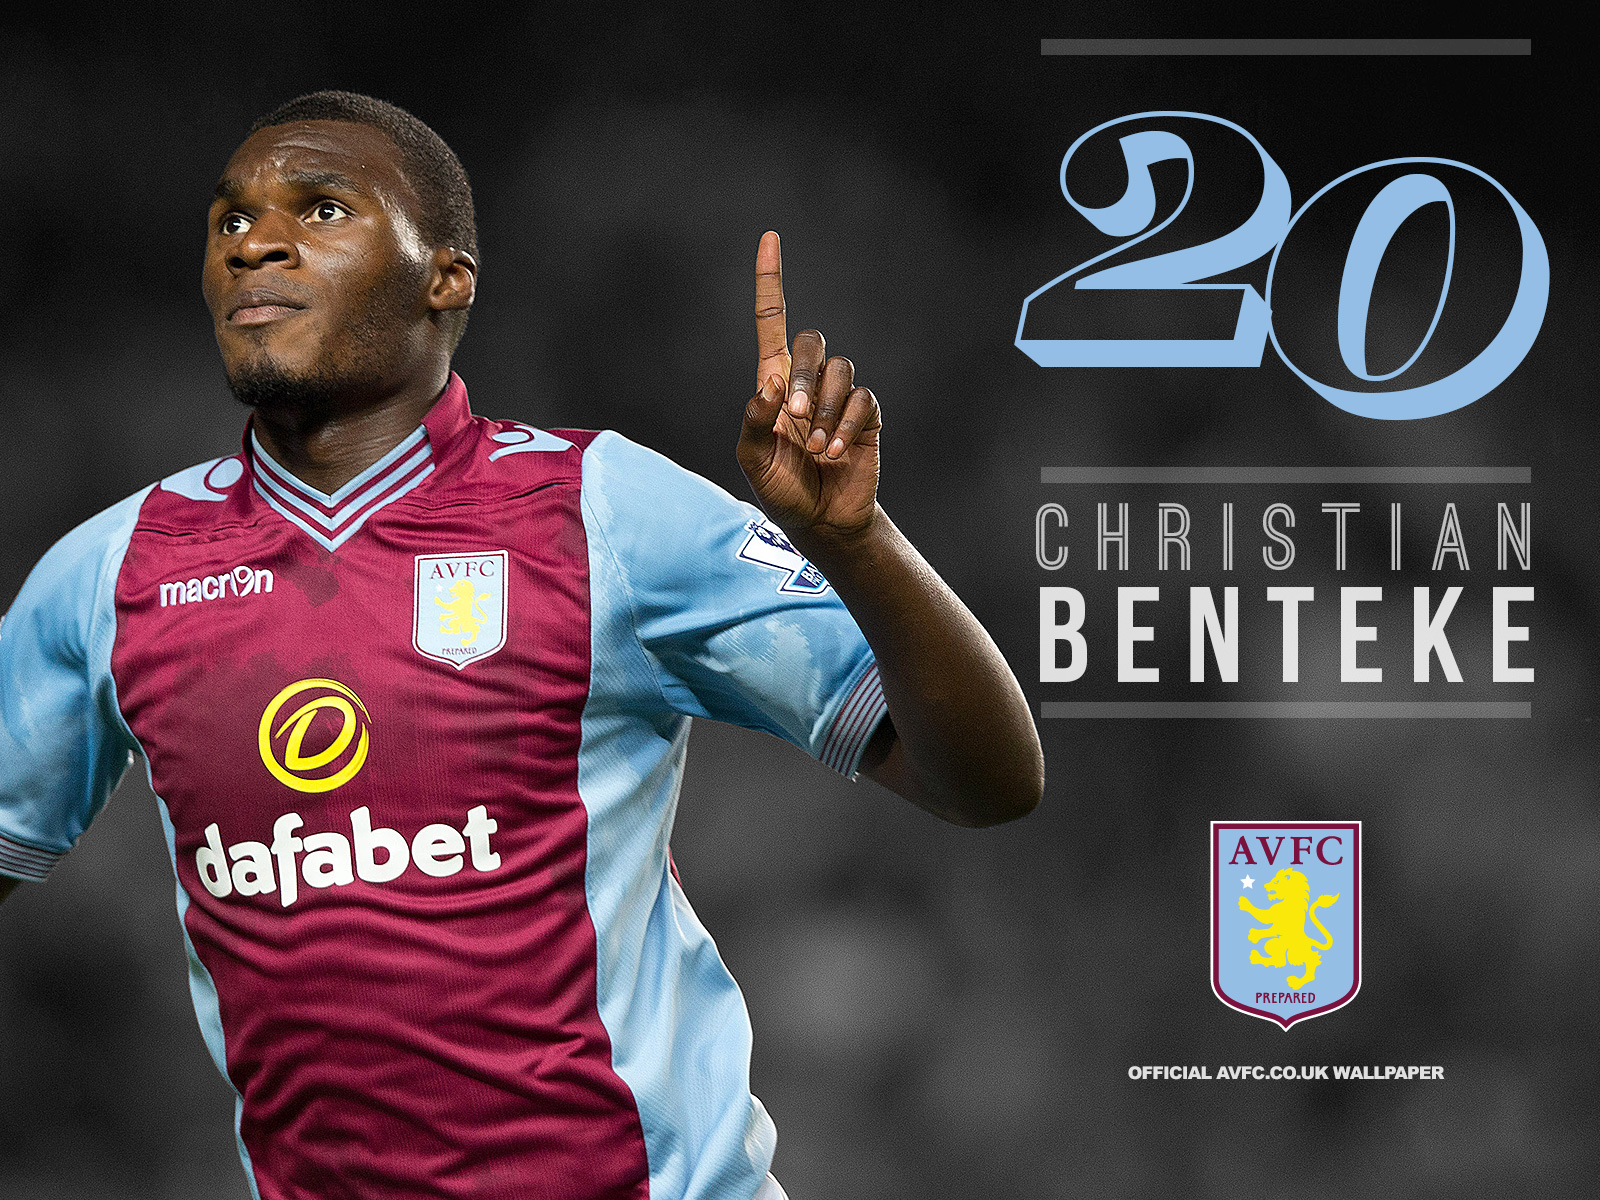 Christian Benteke Football Wallpaper 1600x1200